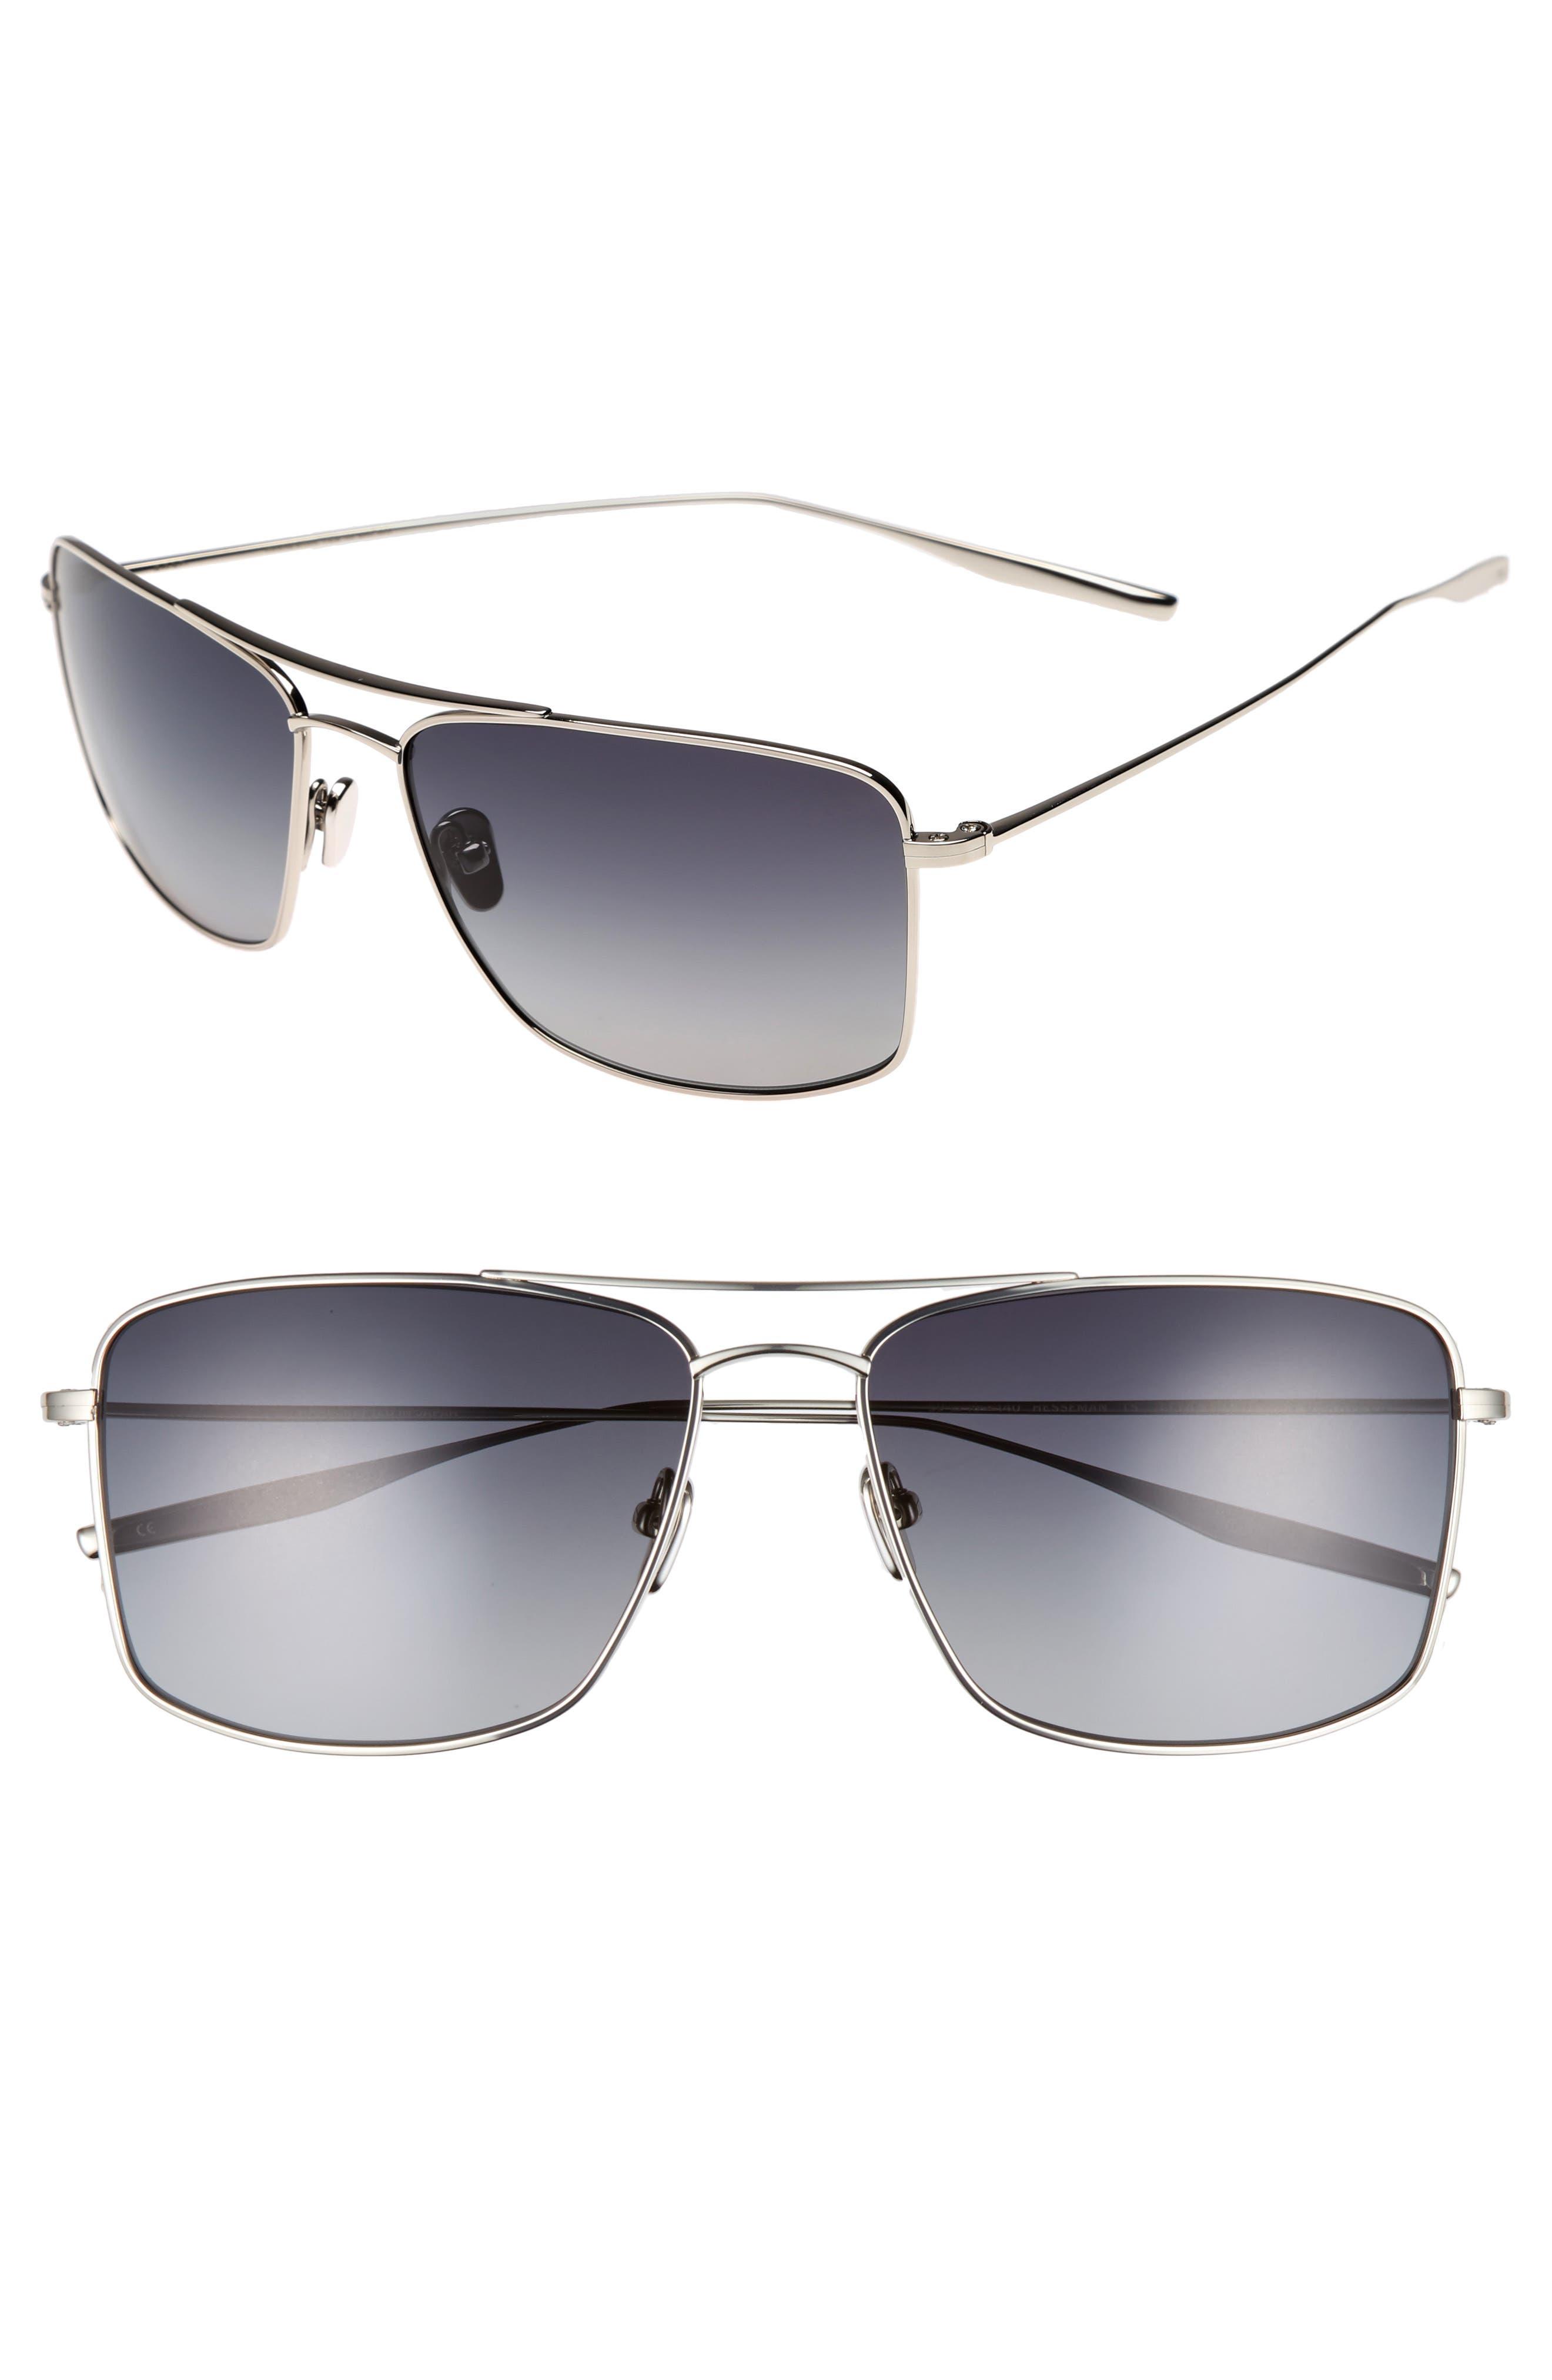 SALT Hesseman 59mm Polarized Sunglasses